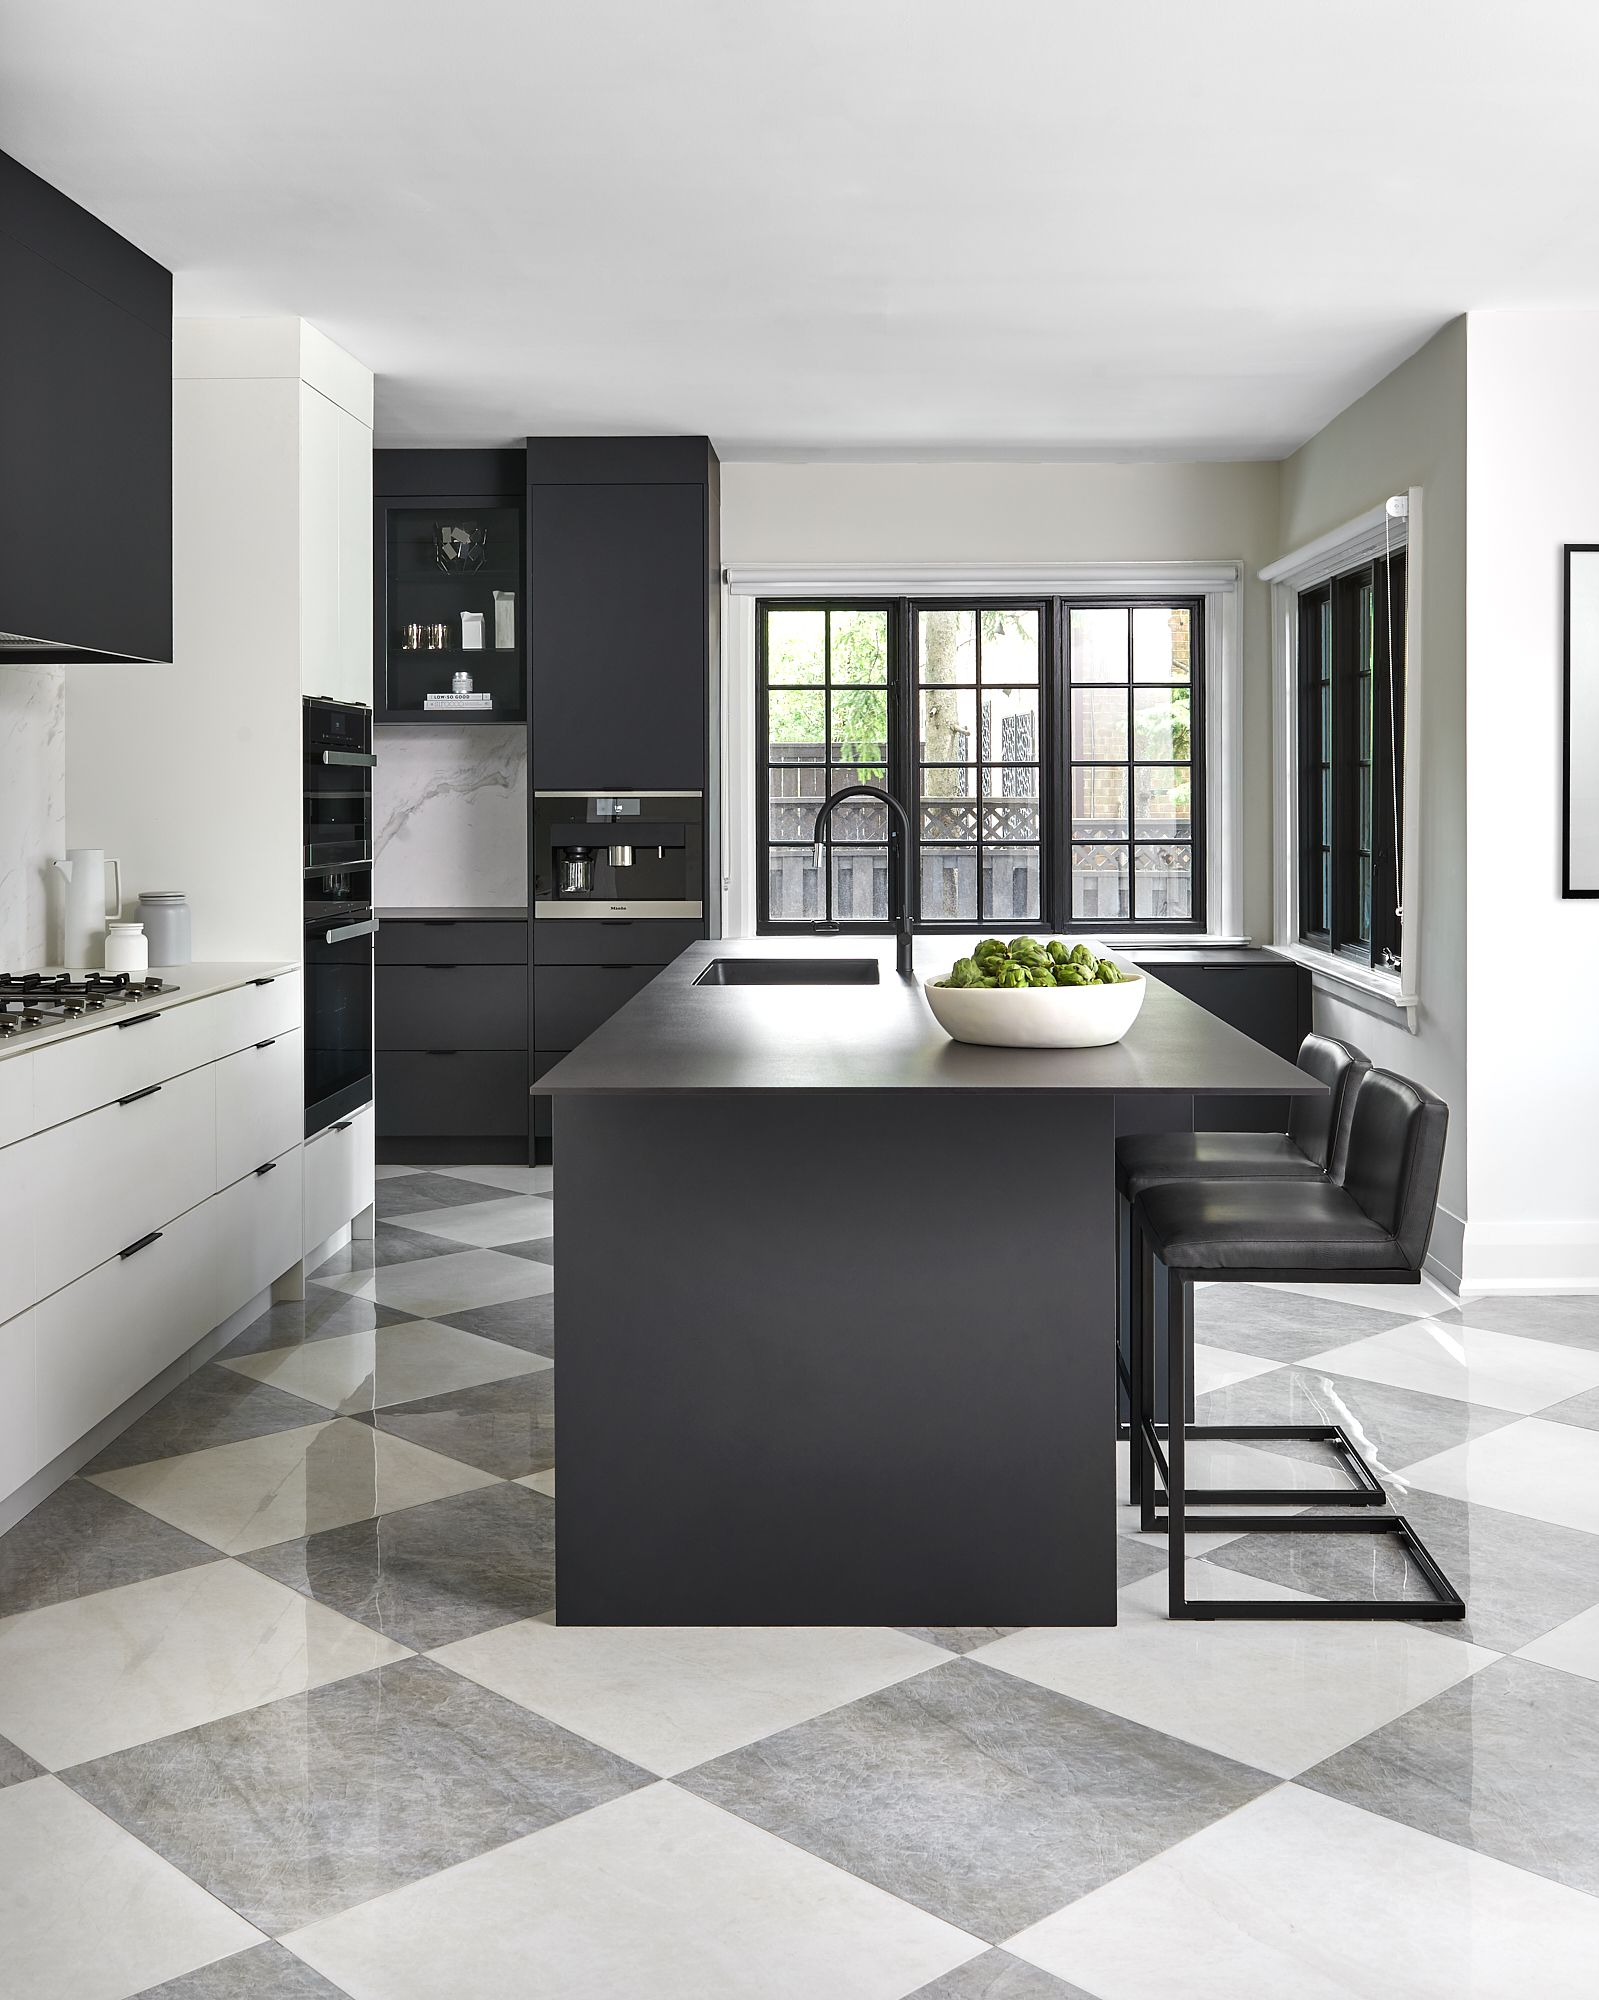 Black And White Kitchen With Checkered Flooring White Tile Kitchen Floor White Kitchen Tiles White Kitchen Floor